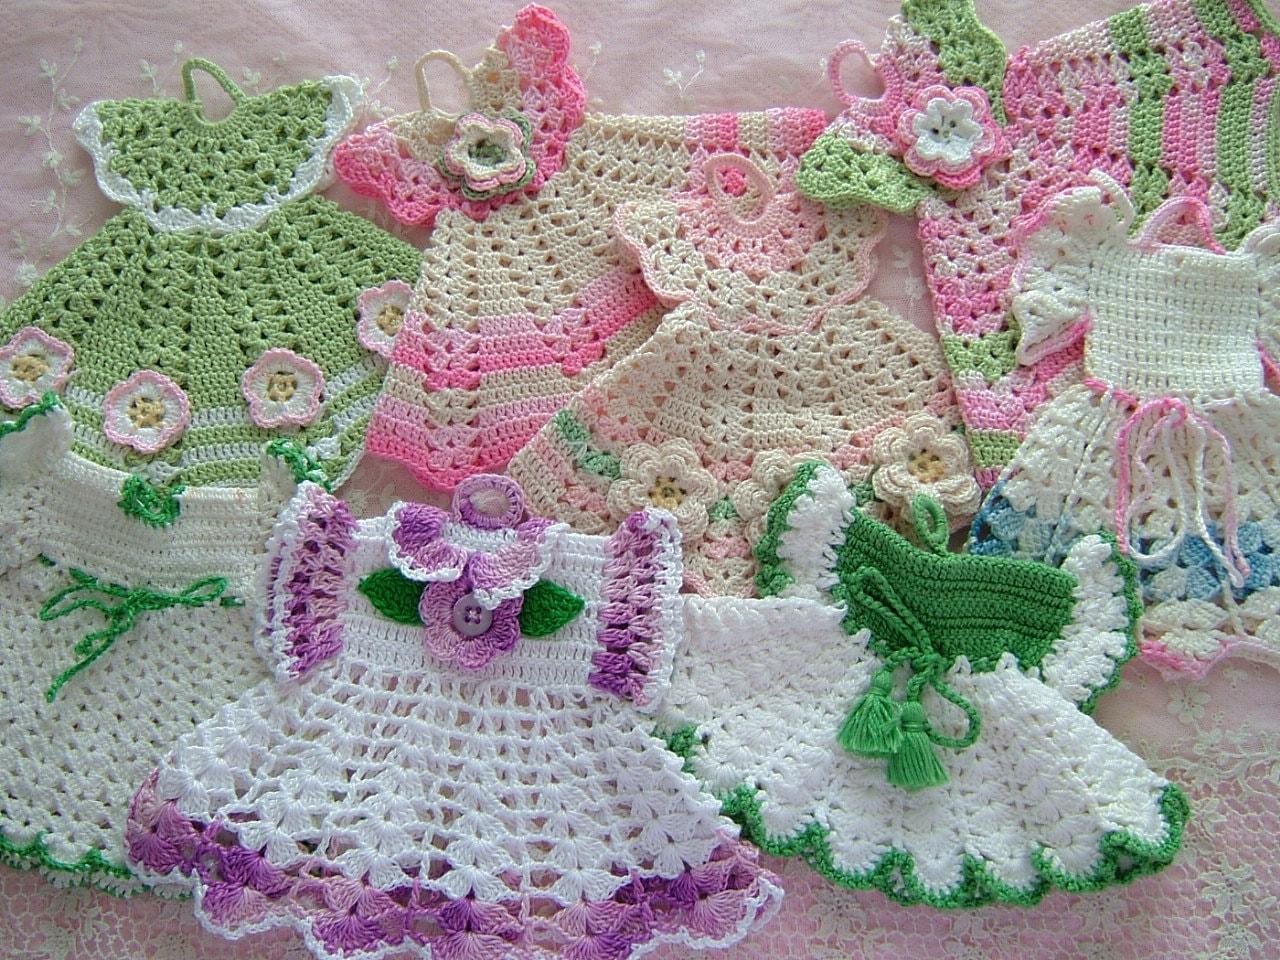 Crochet Pattern For A Doll : Vintage Cotton Crochet Pot Holder Doll Dress